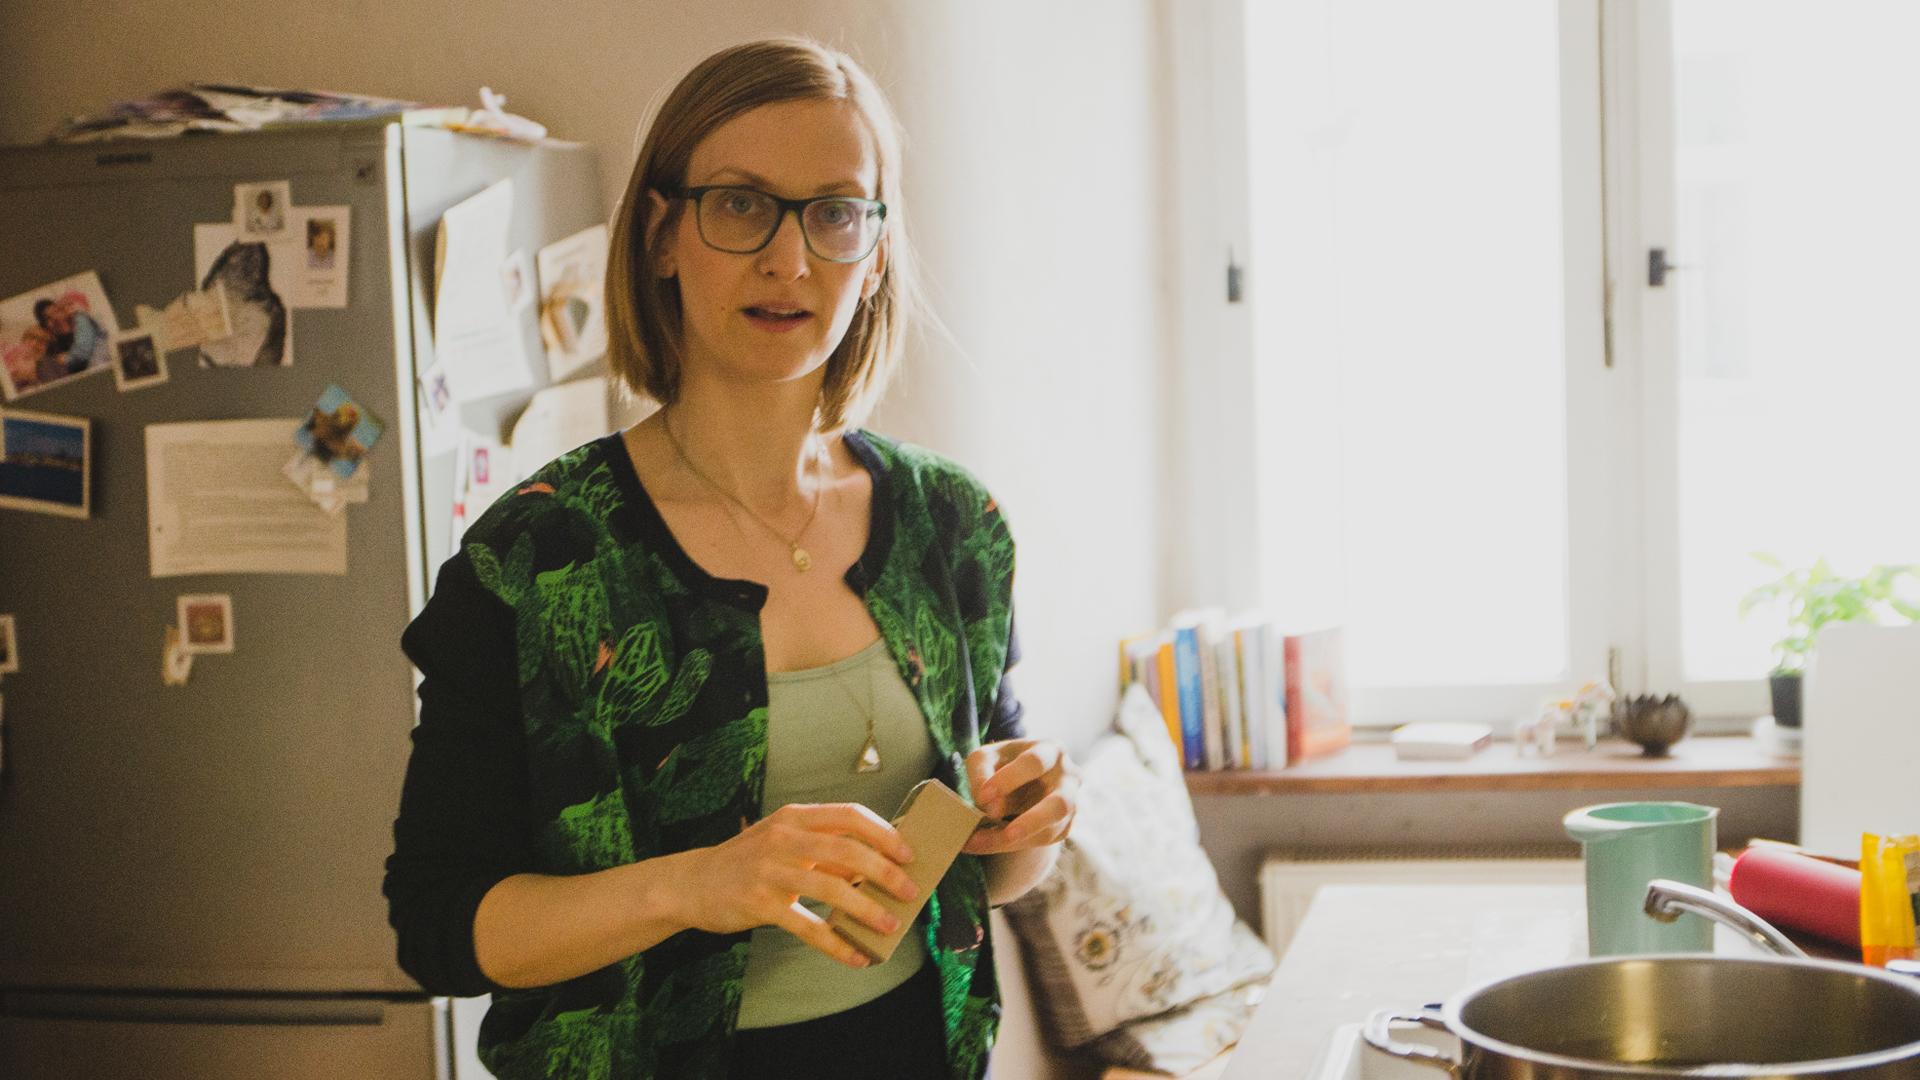 Isabella-Paulsen-talks-about-leaky-gut,-meditation,-yoga-and-bone-broth-Foodadit